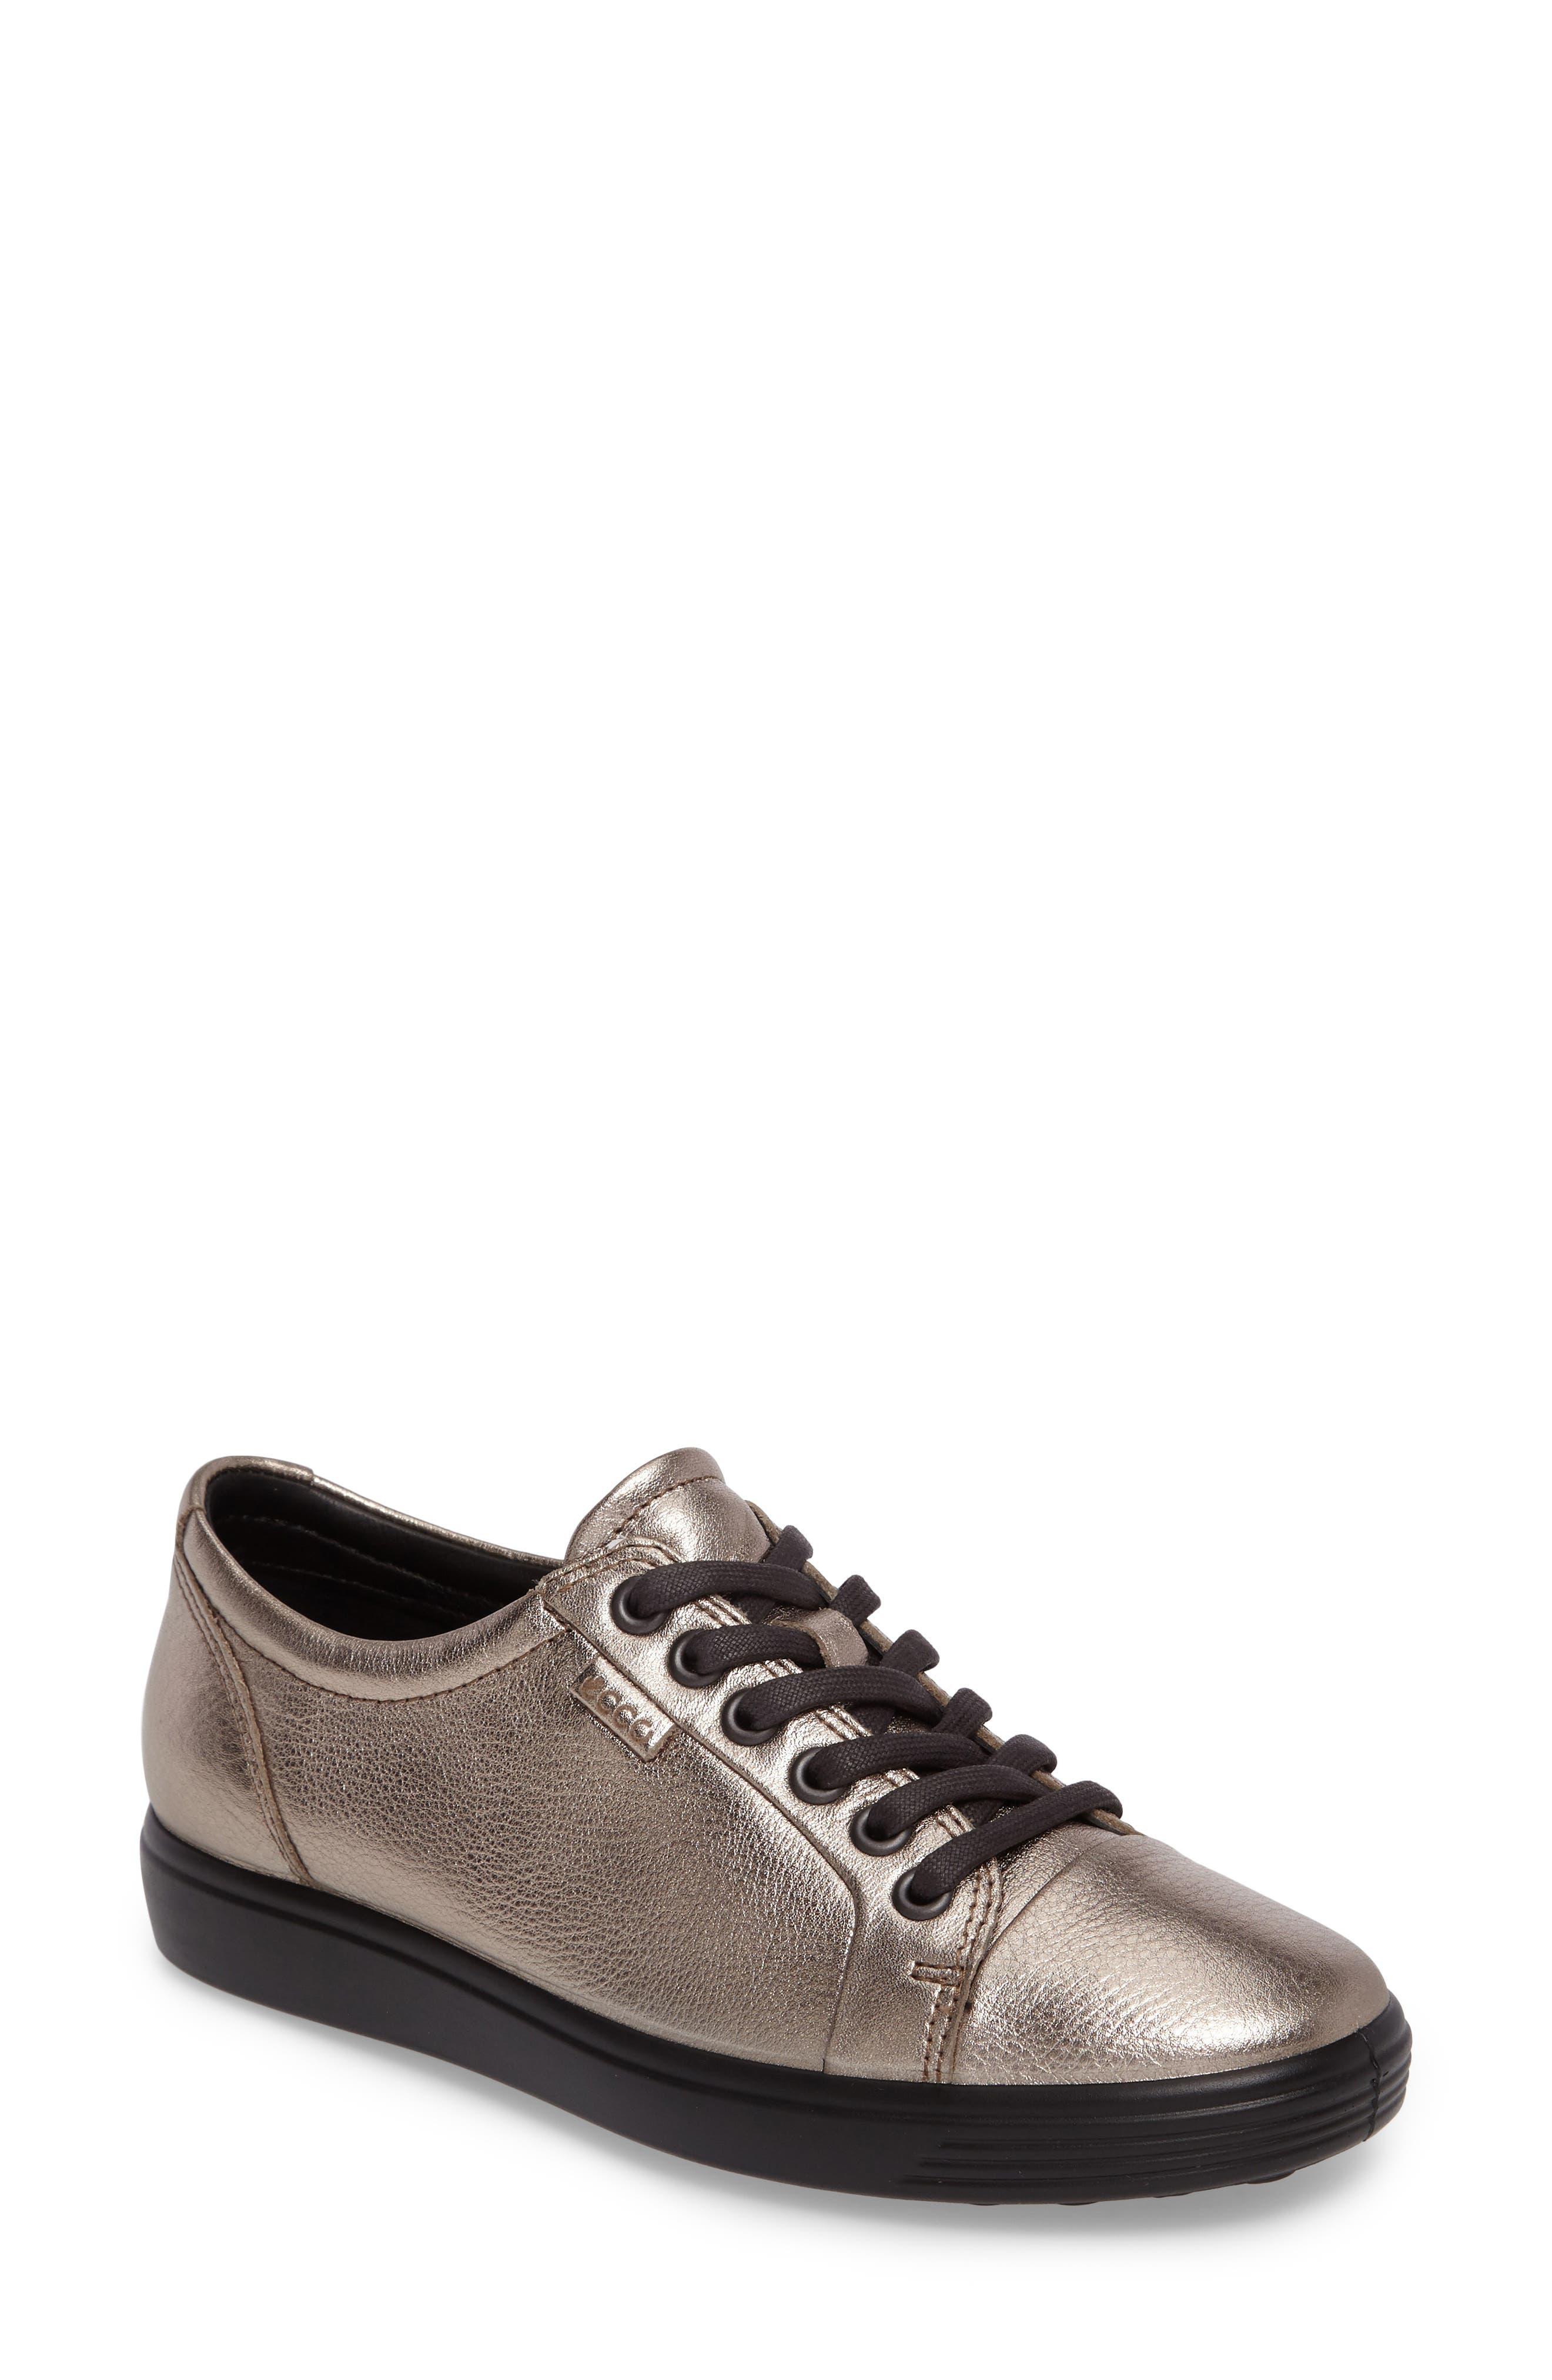 ,                             Soft 7 Sneaker,                             Main thumbnail 209, color,                             050